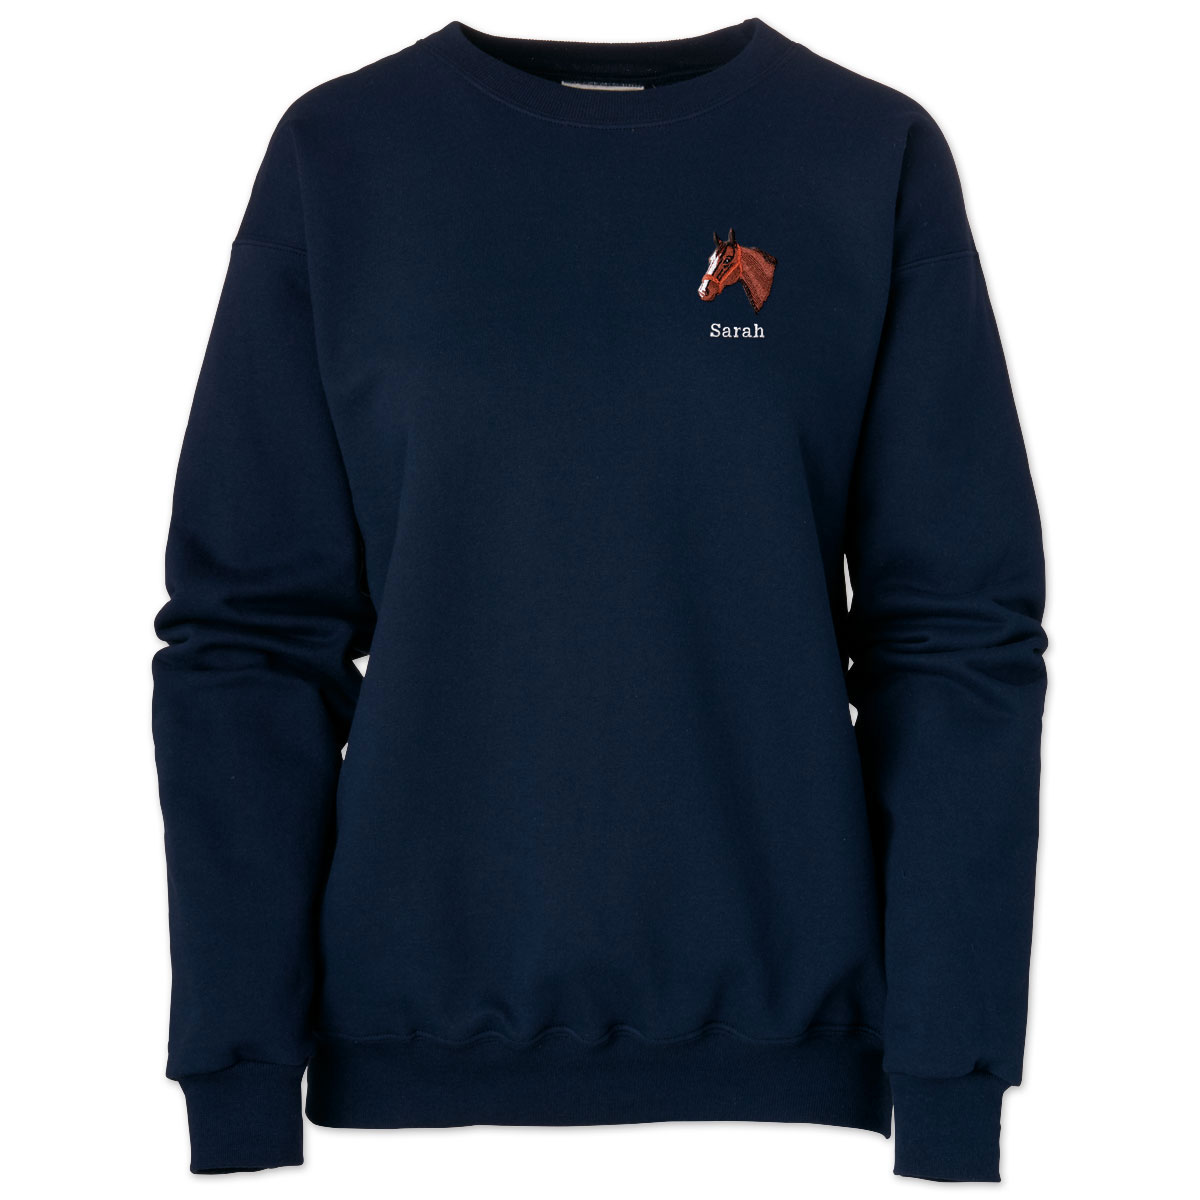 b369d1f37029 Personalized Sweatshirt